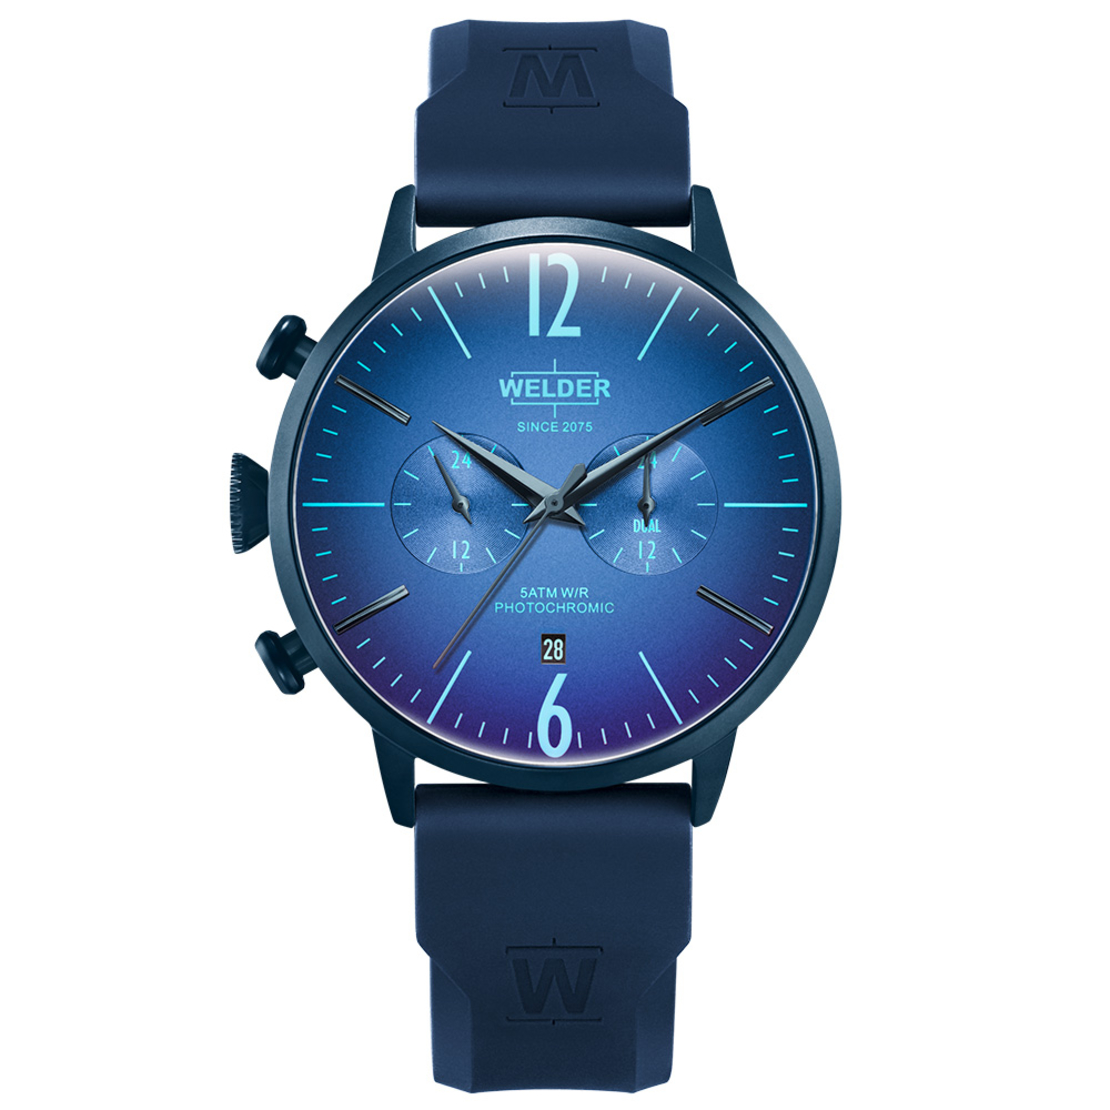 WWRC513 45MM BLUE